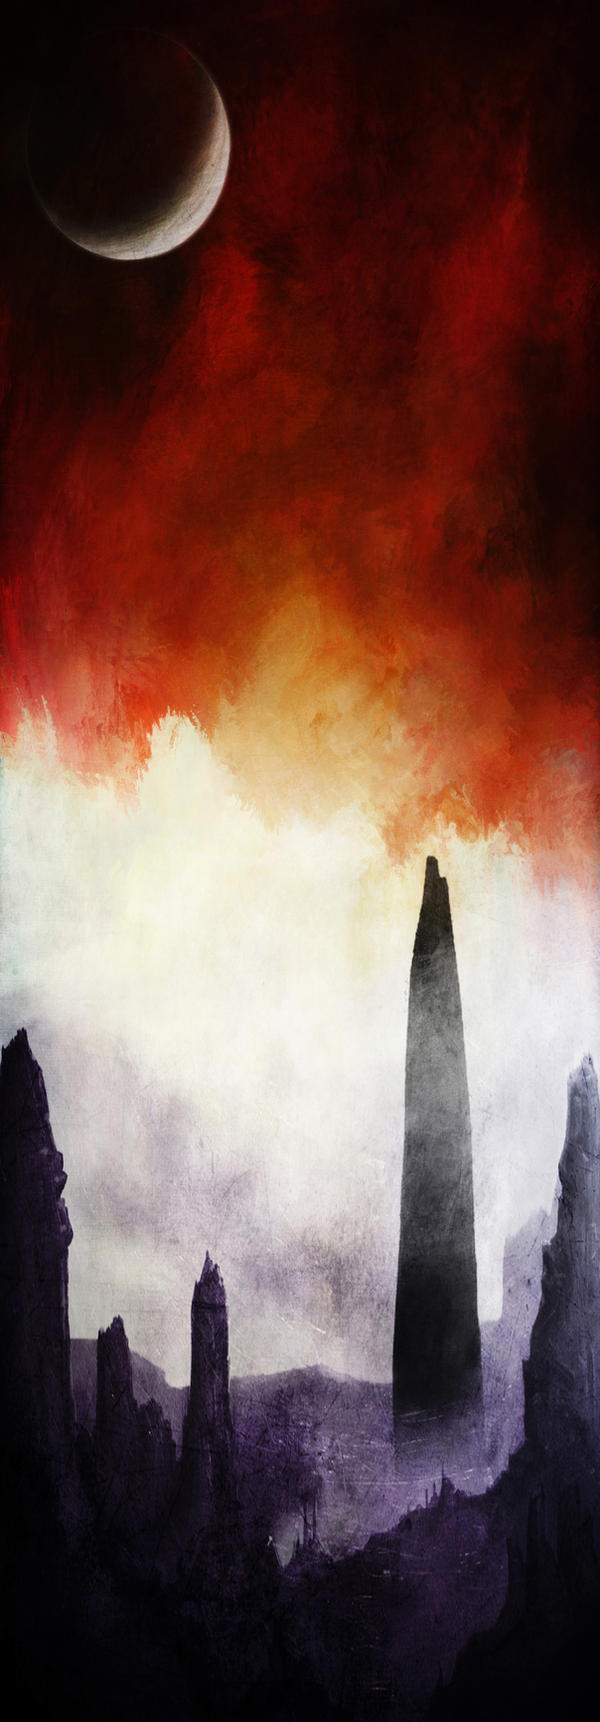 The Sky Ablaze by TALONABRAXAS